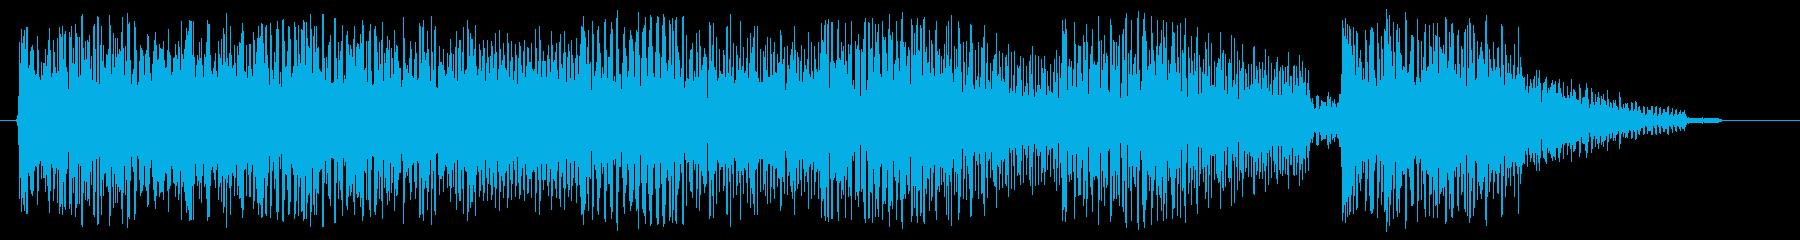 8bitなジングル 場面転換 切替の再生済みの波形